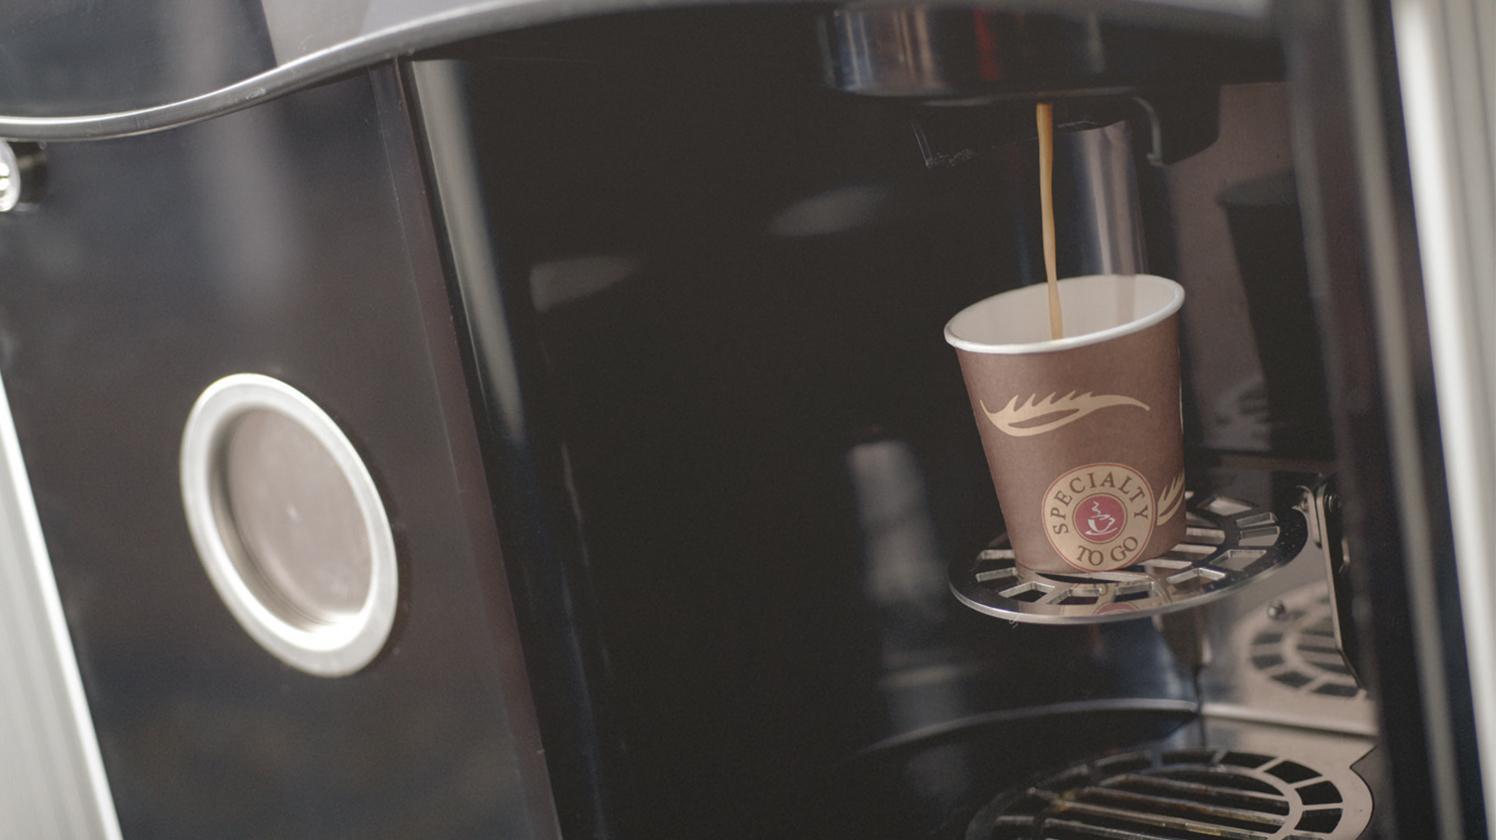 BRITA Wasser Verkaufsautomat Kaffeemaschine